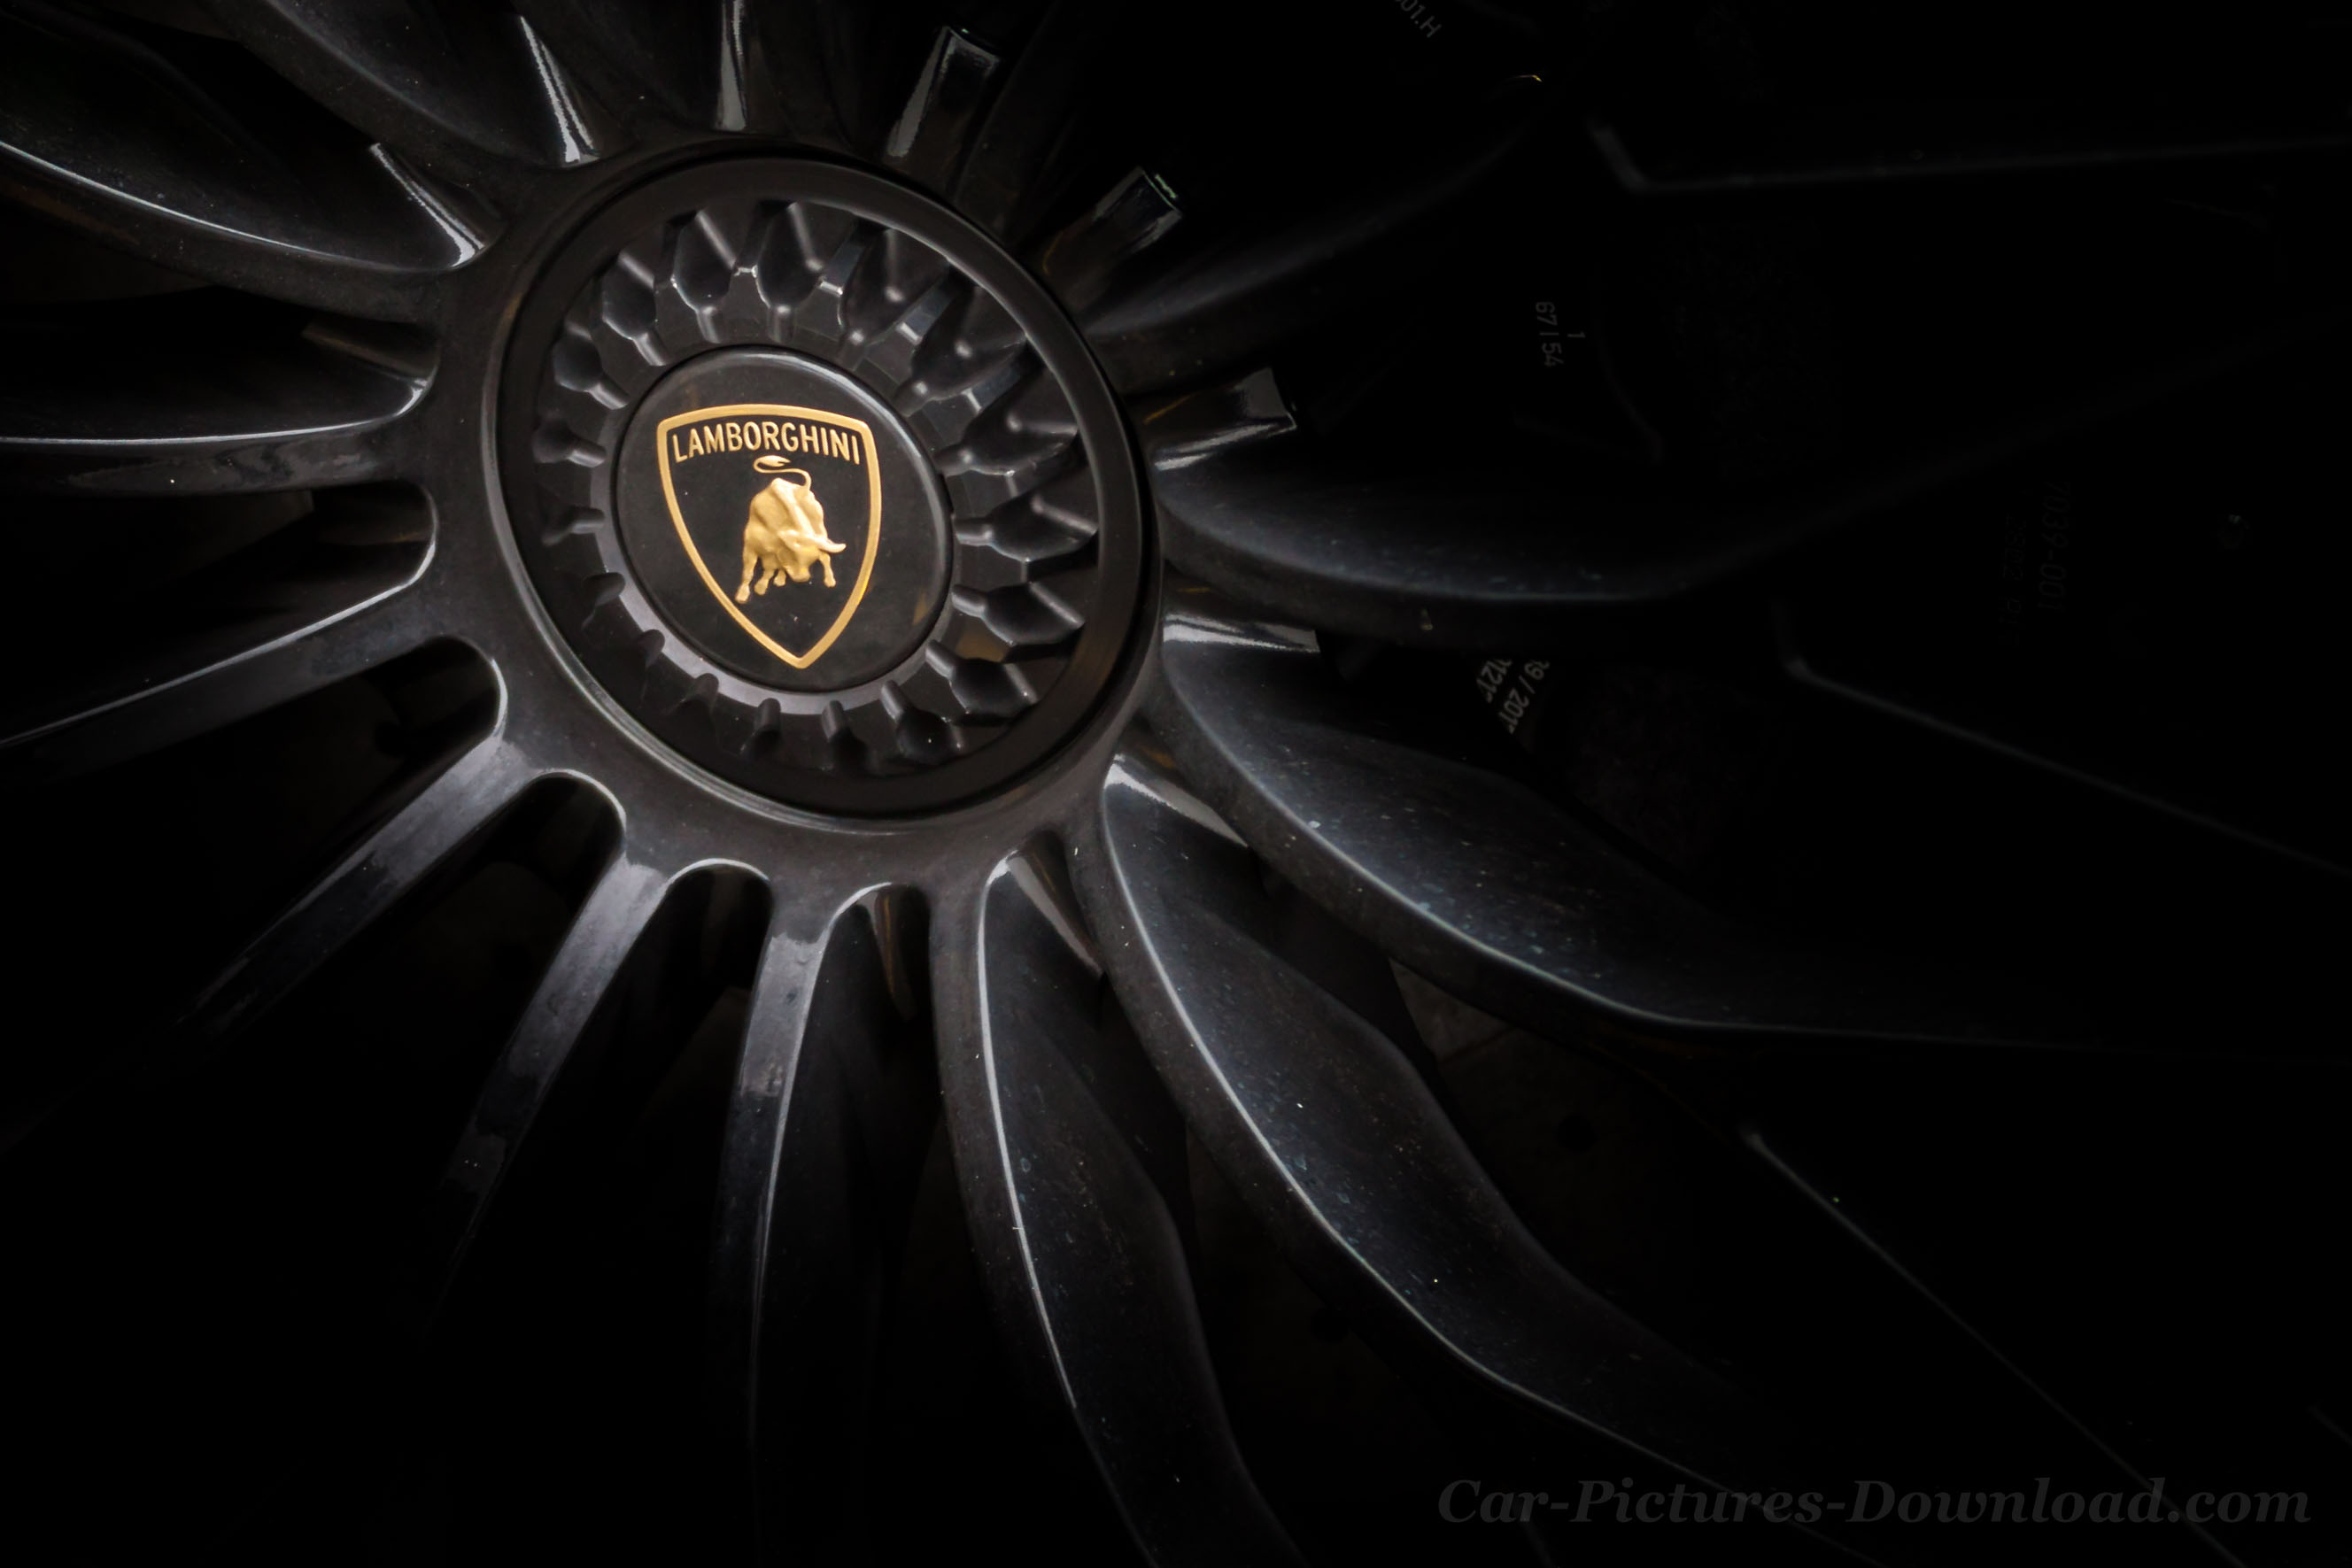 Lamborghini Wallpaper Images   4K Ultra HD Screens   Download 2656x1771